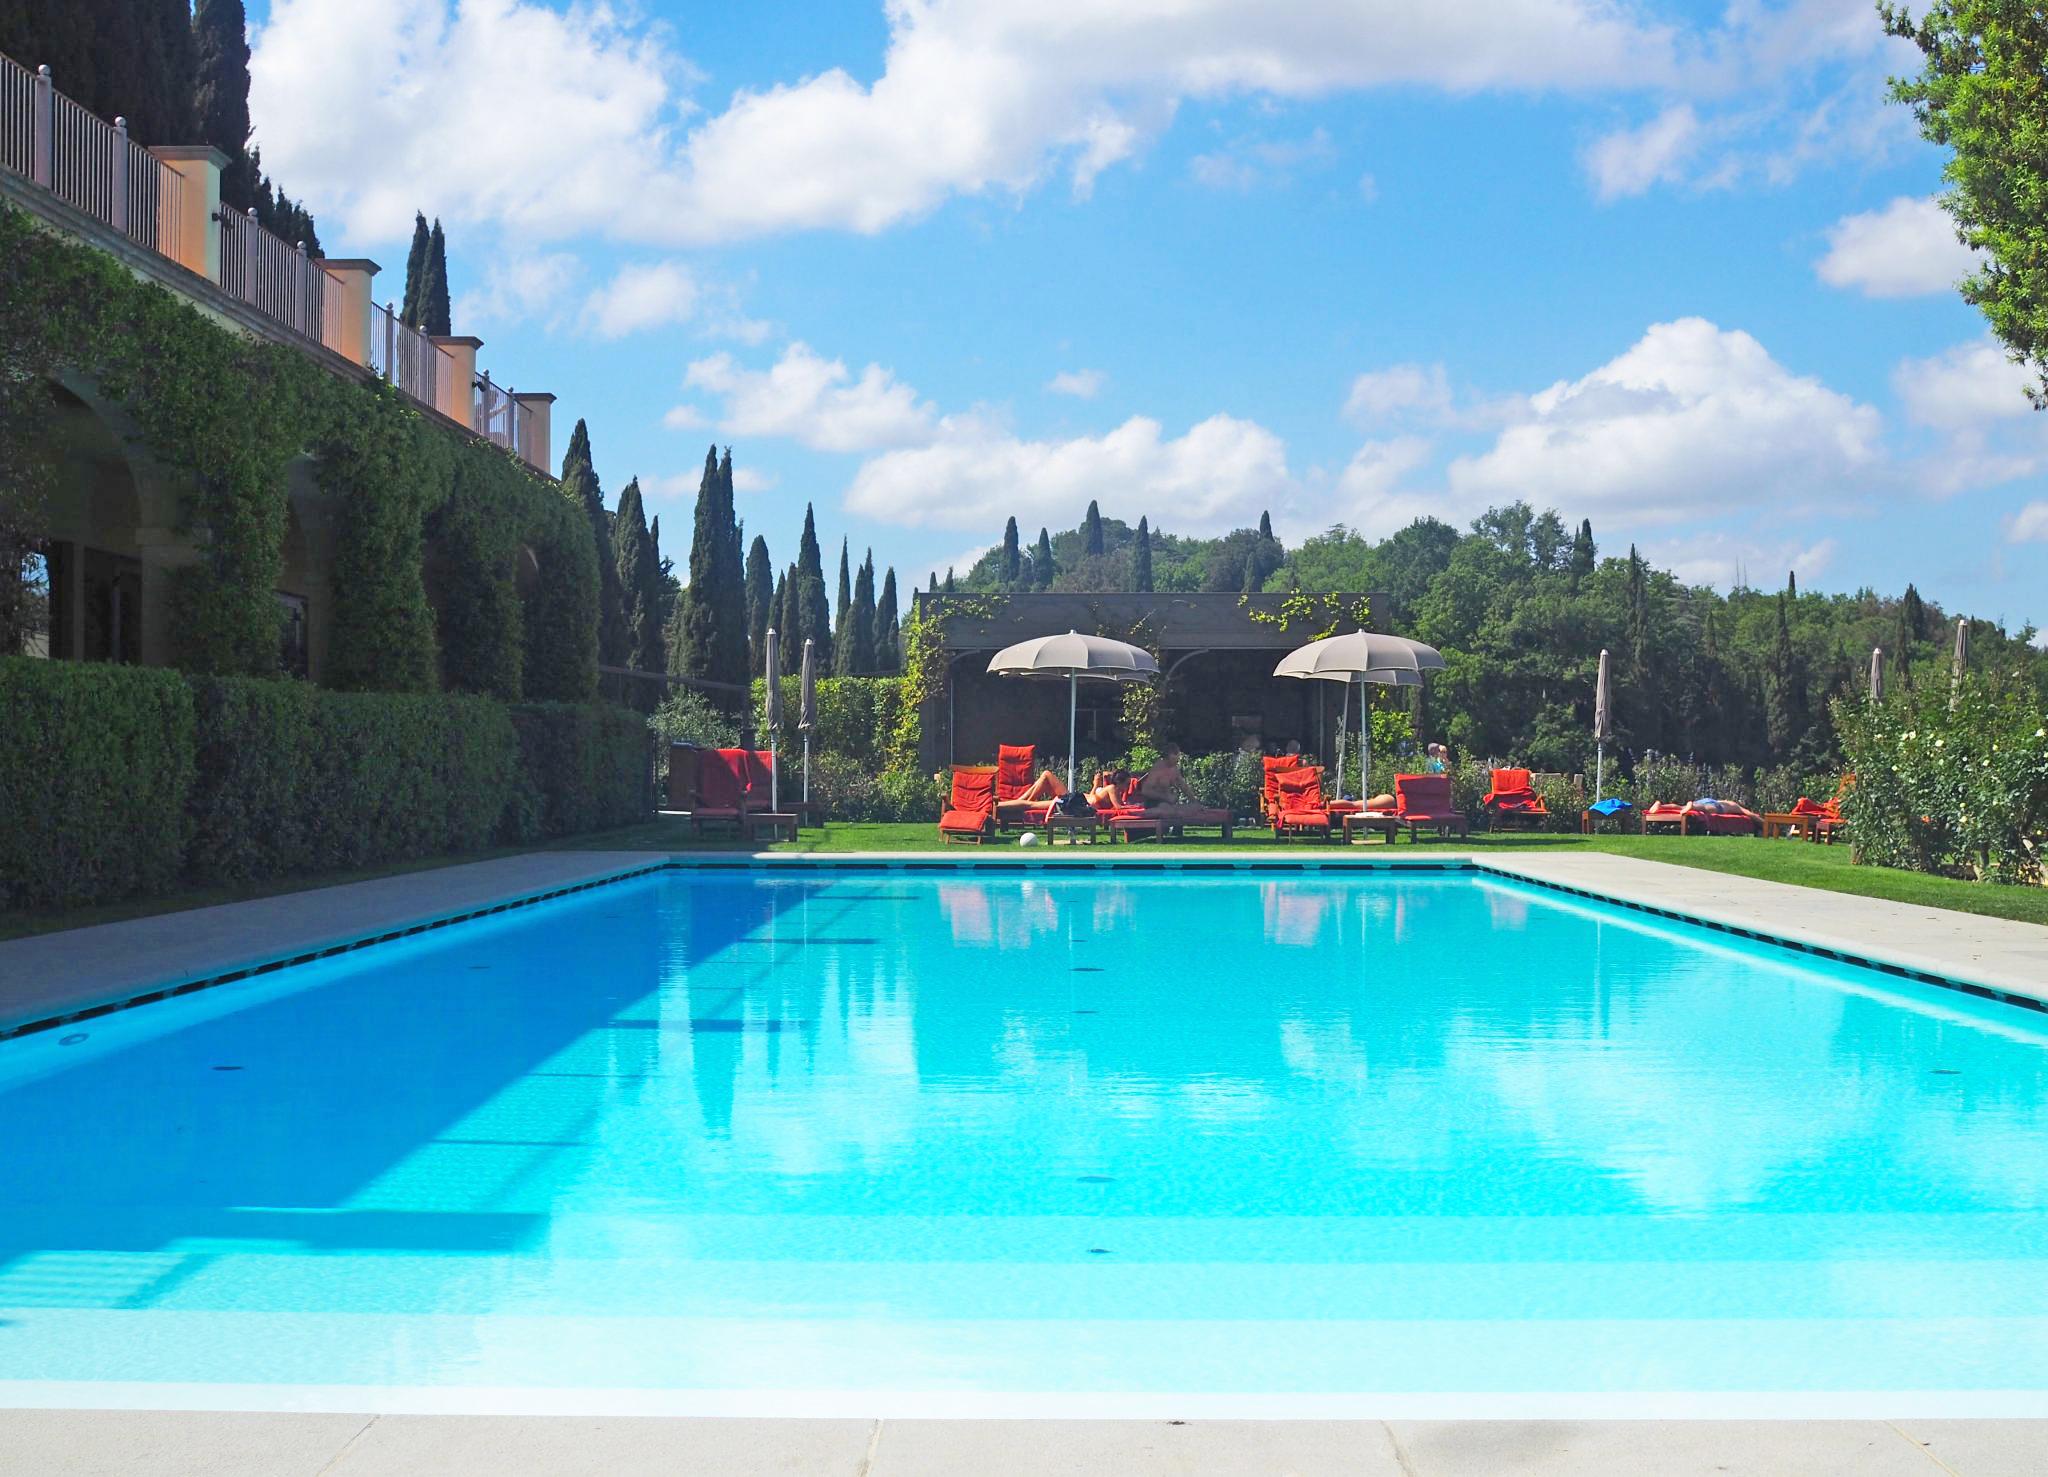 Luxury Travel: Castello Del Nero, Tuscany